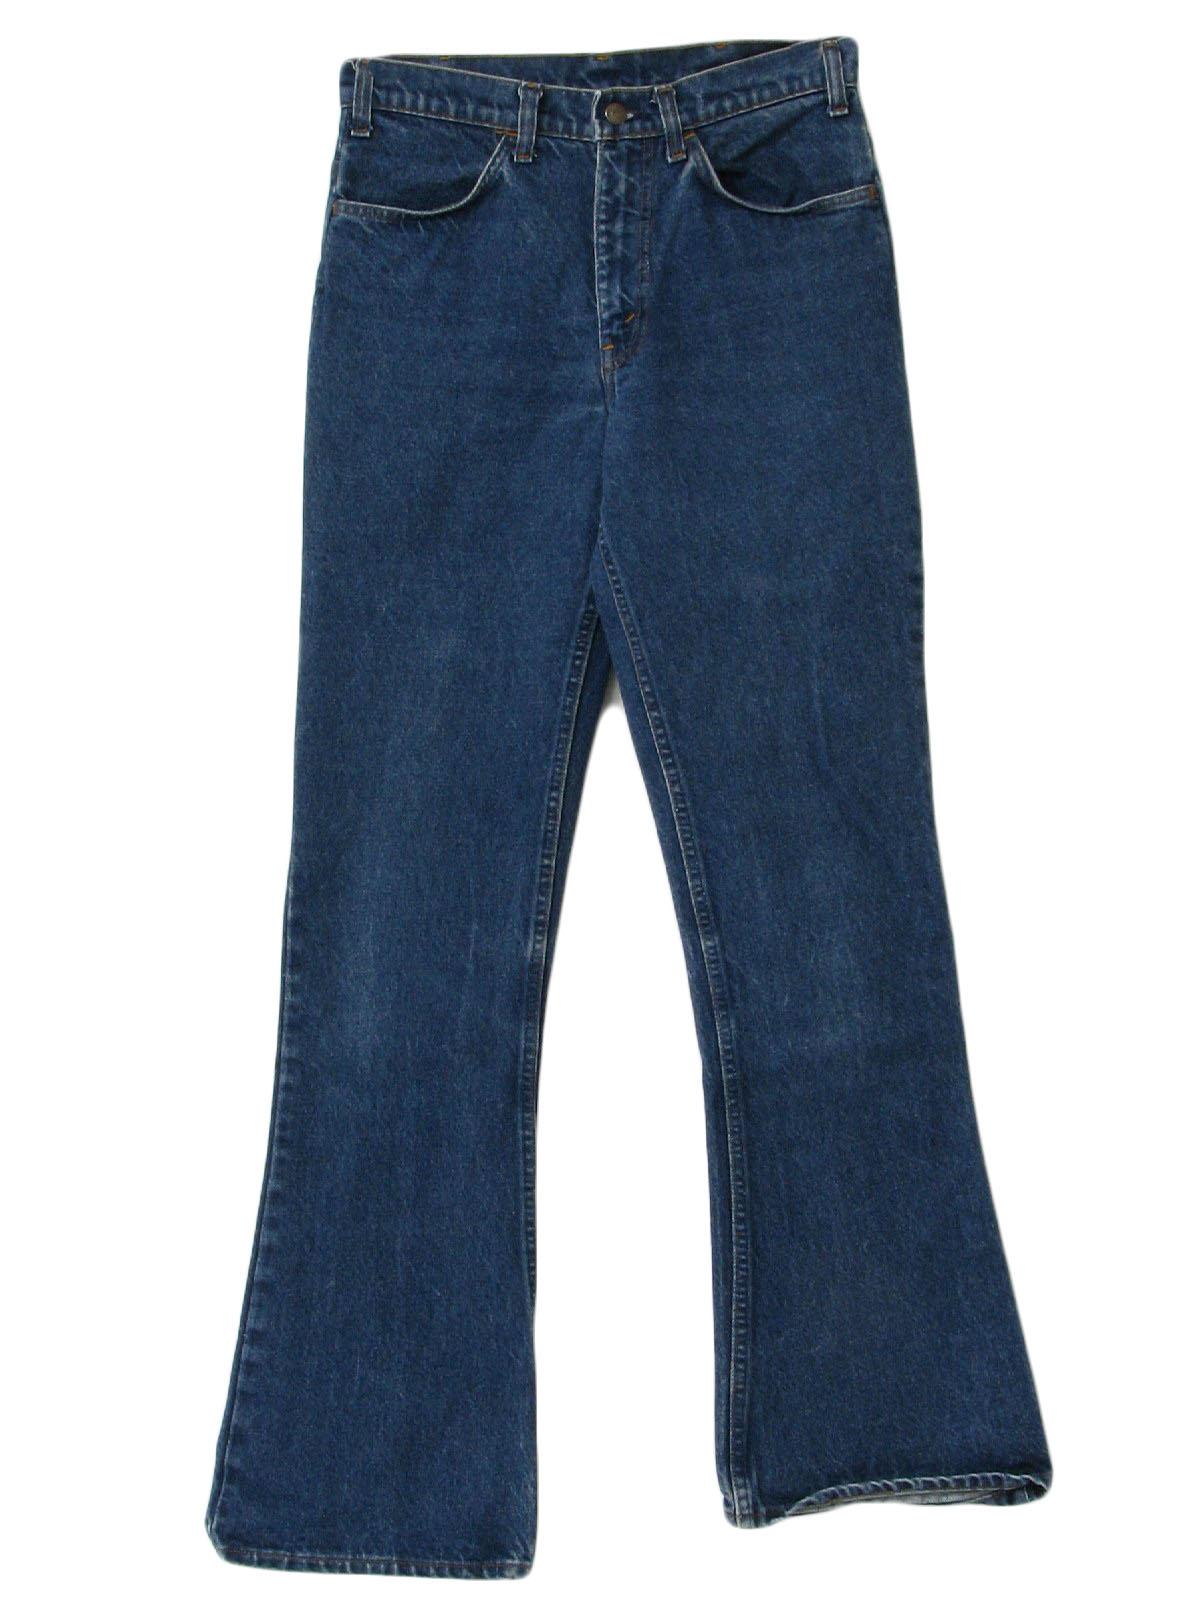 Levis 80's Vintage Flared Pants / Flares: 80s -Levis- Mens dark ...